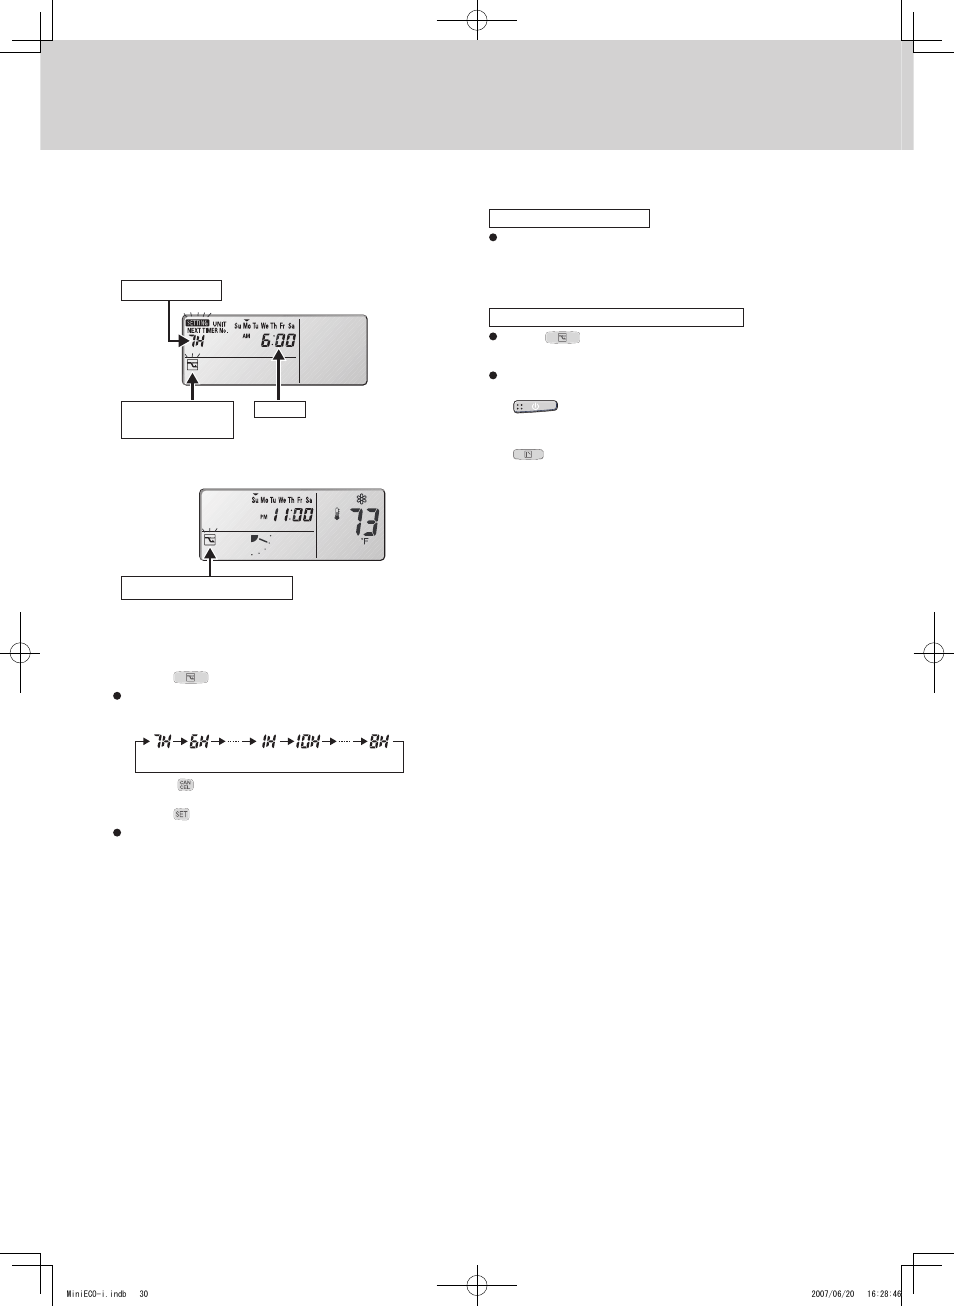 timer remote controller rcs tm80bg sanyo chx06052 user manual rh manualsdir com User Manual PDF sanyo rcs-tm80bg owners manual